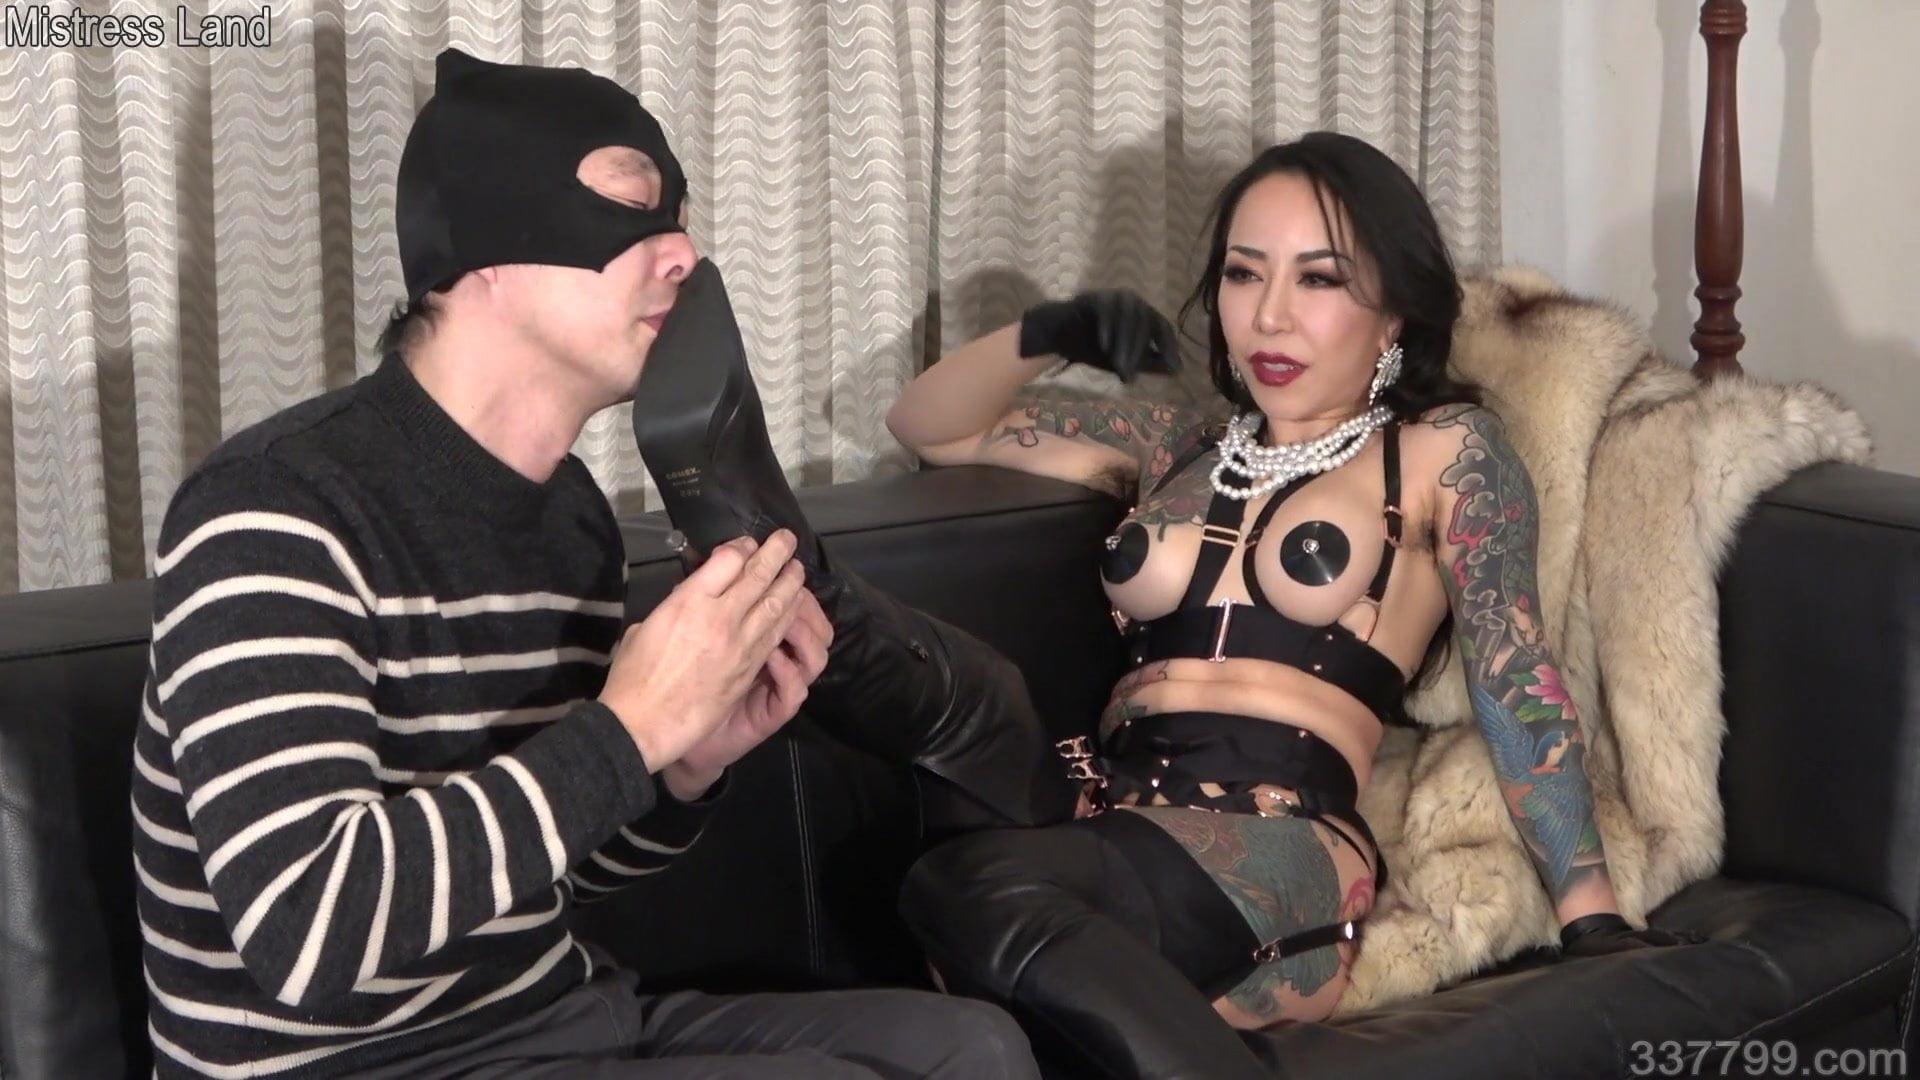 337799 Porn mldo-167 mistress land youko